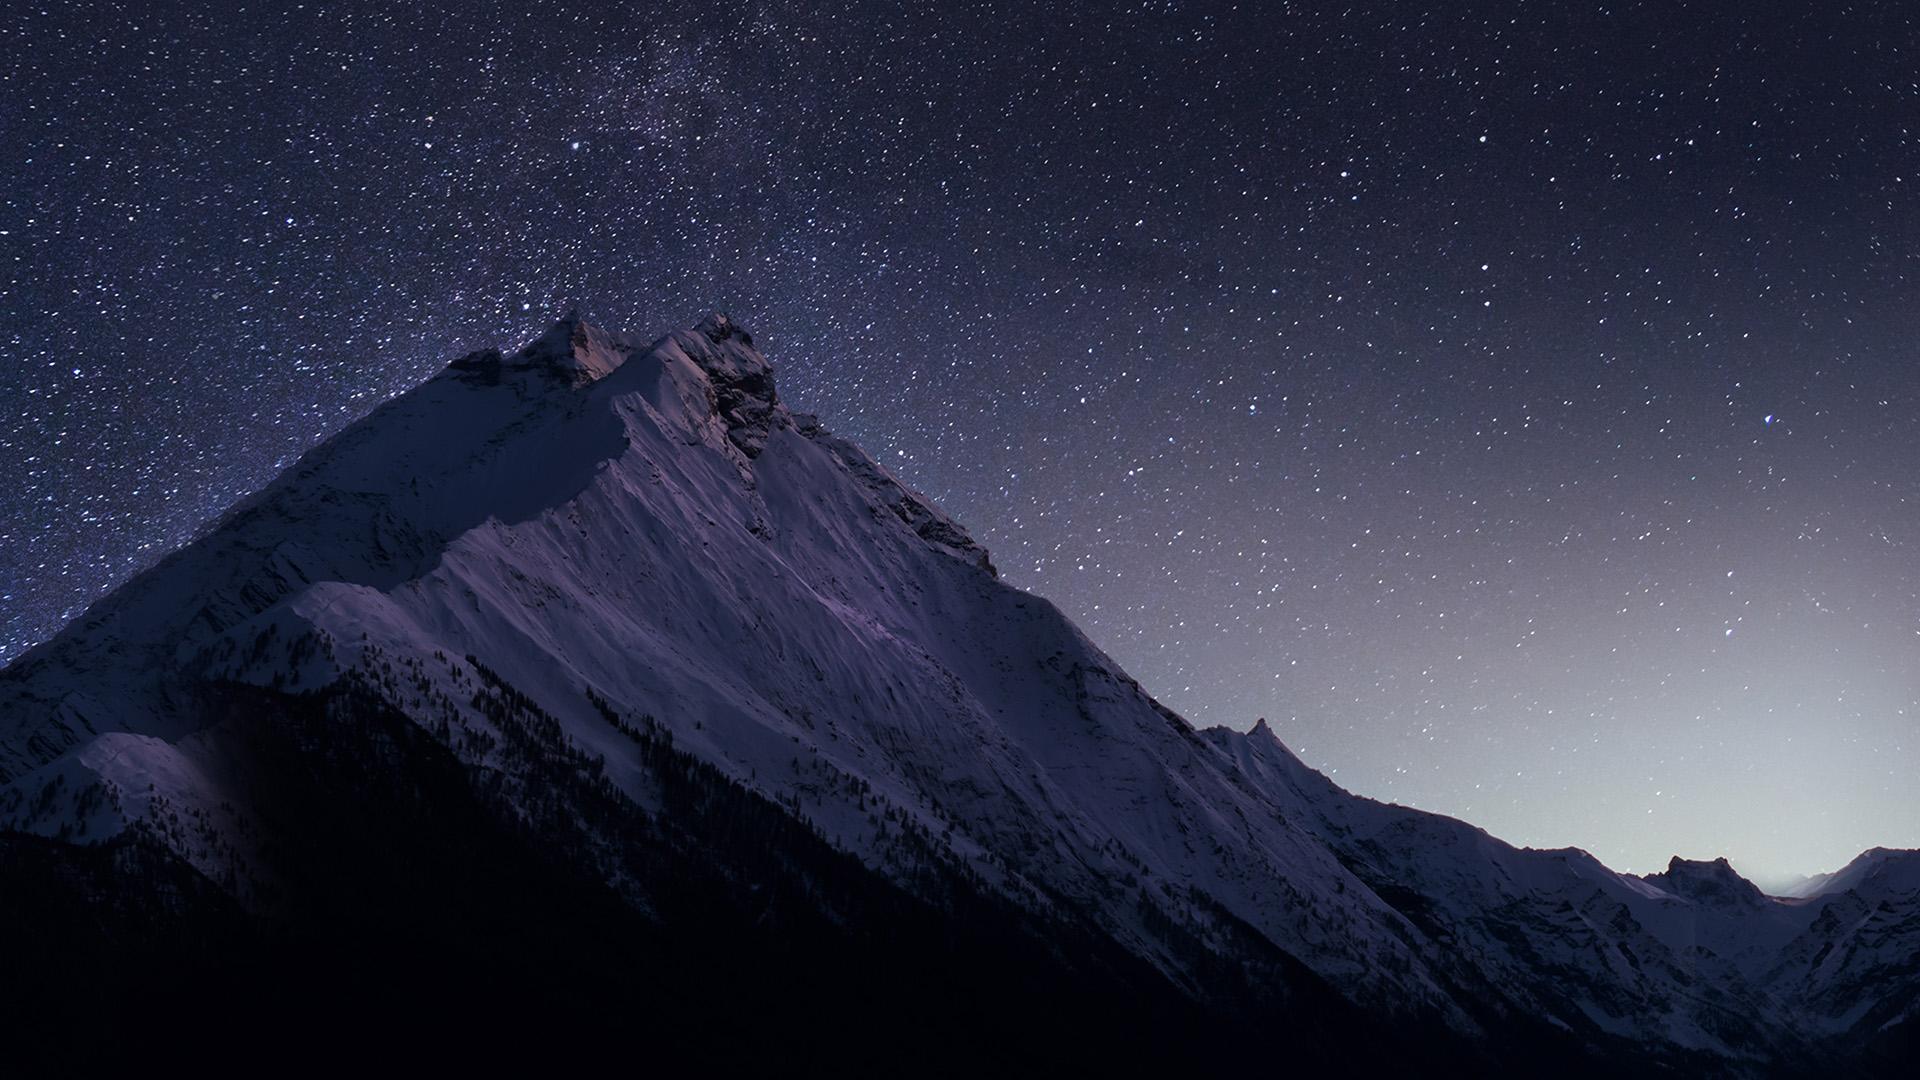 2560 x 1600 - Night mountain wallpaper 4k ...